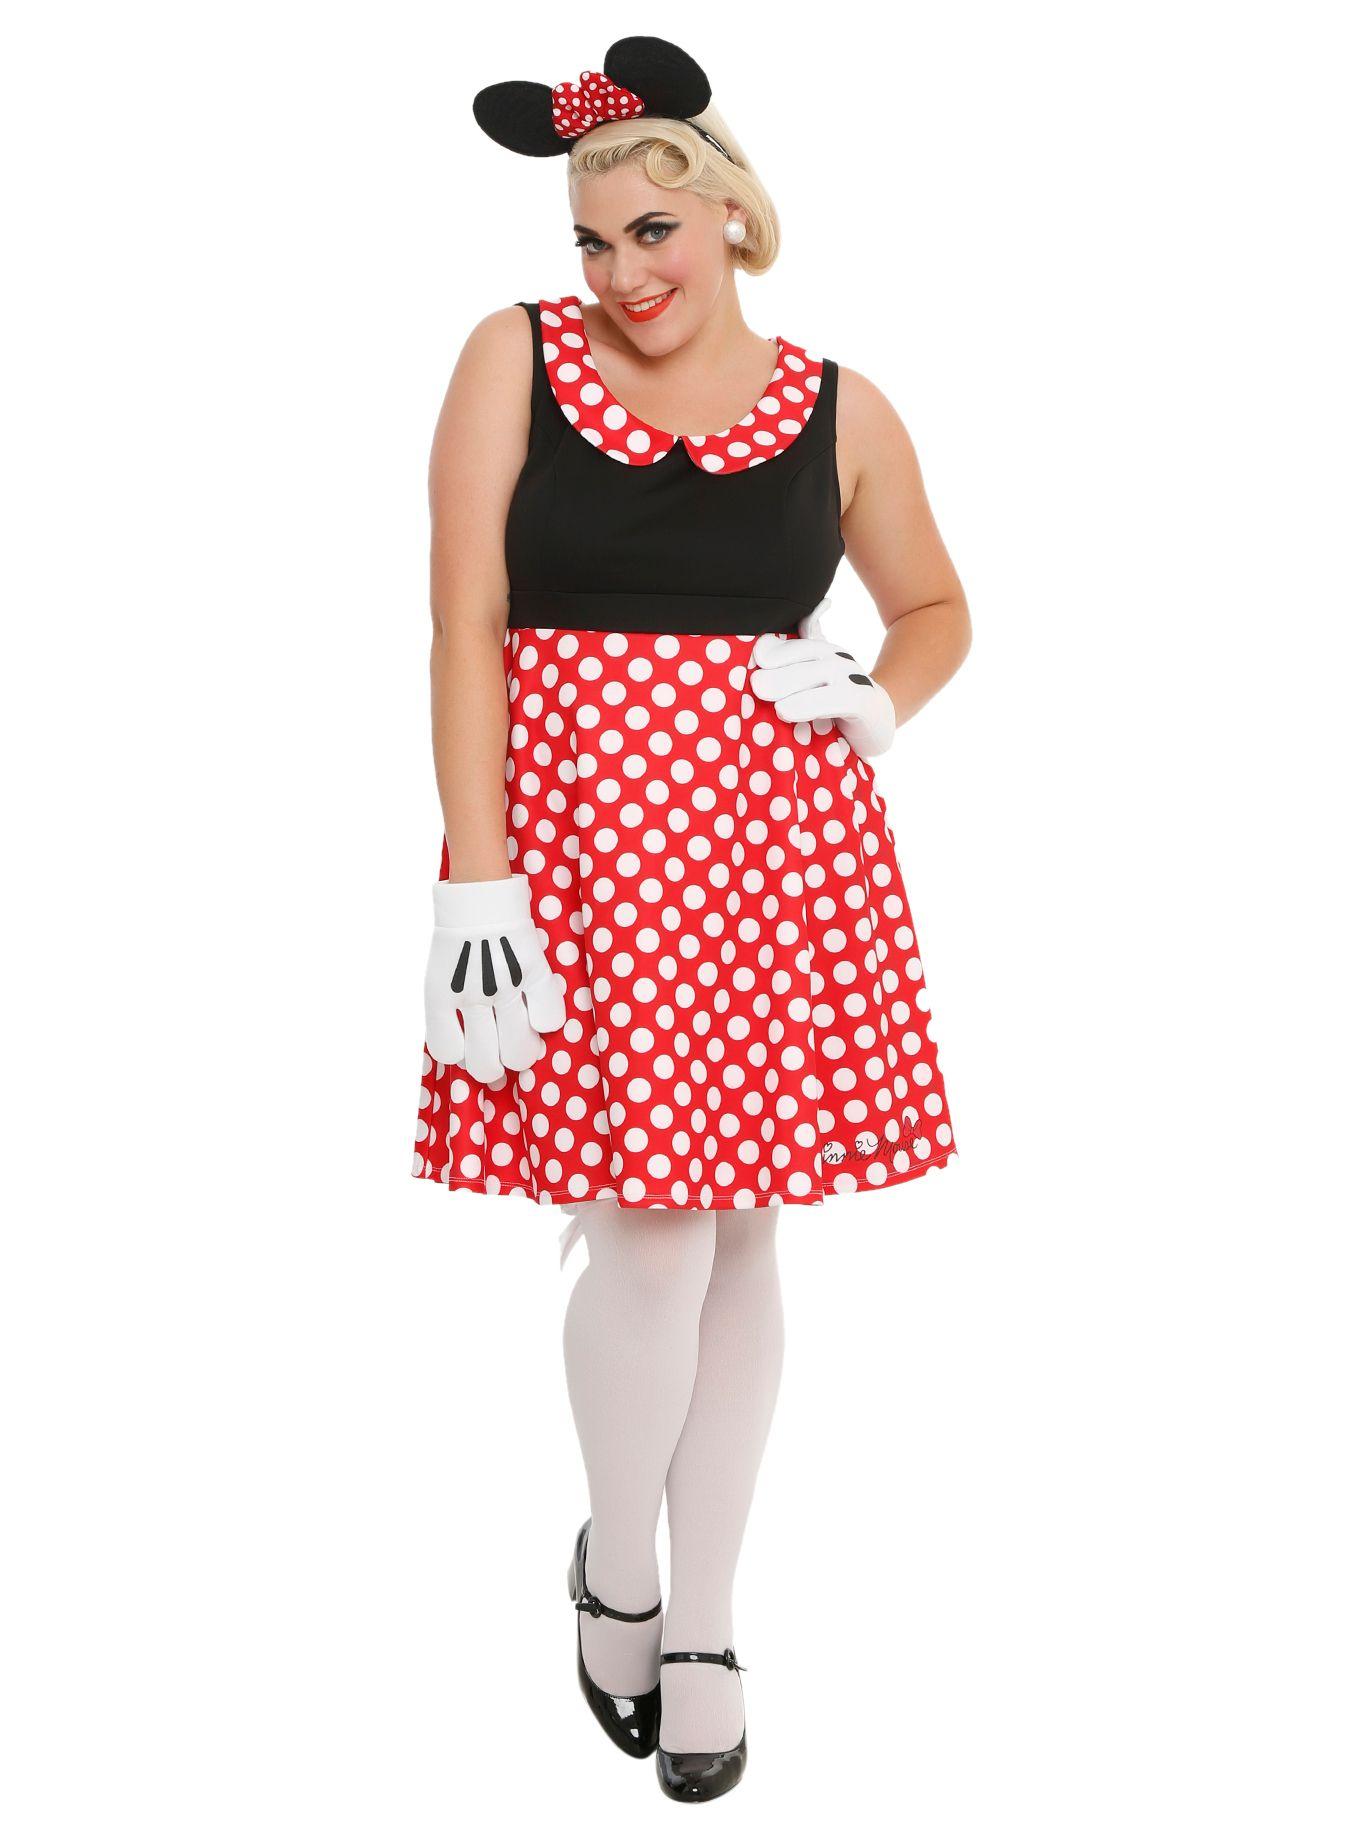 Disney Minnie Mouse Polka Dot Dress Plus Size | disney bounding ...